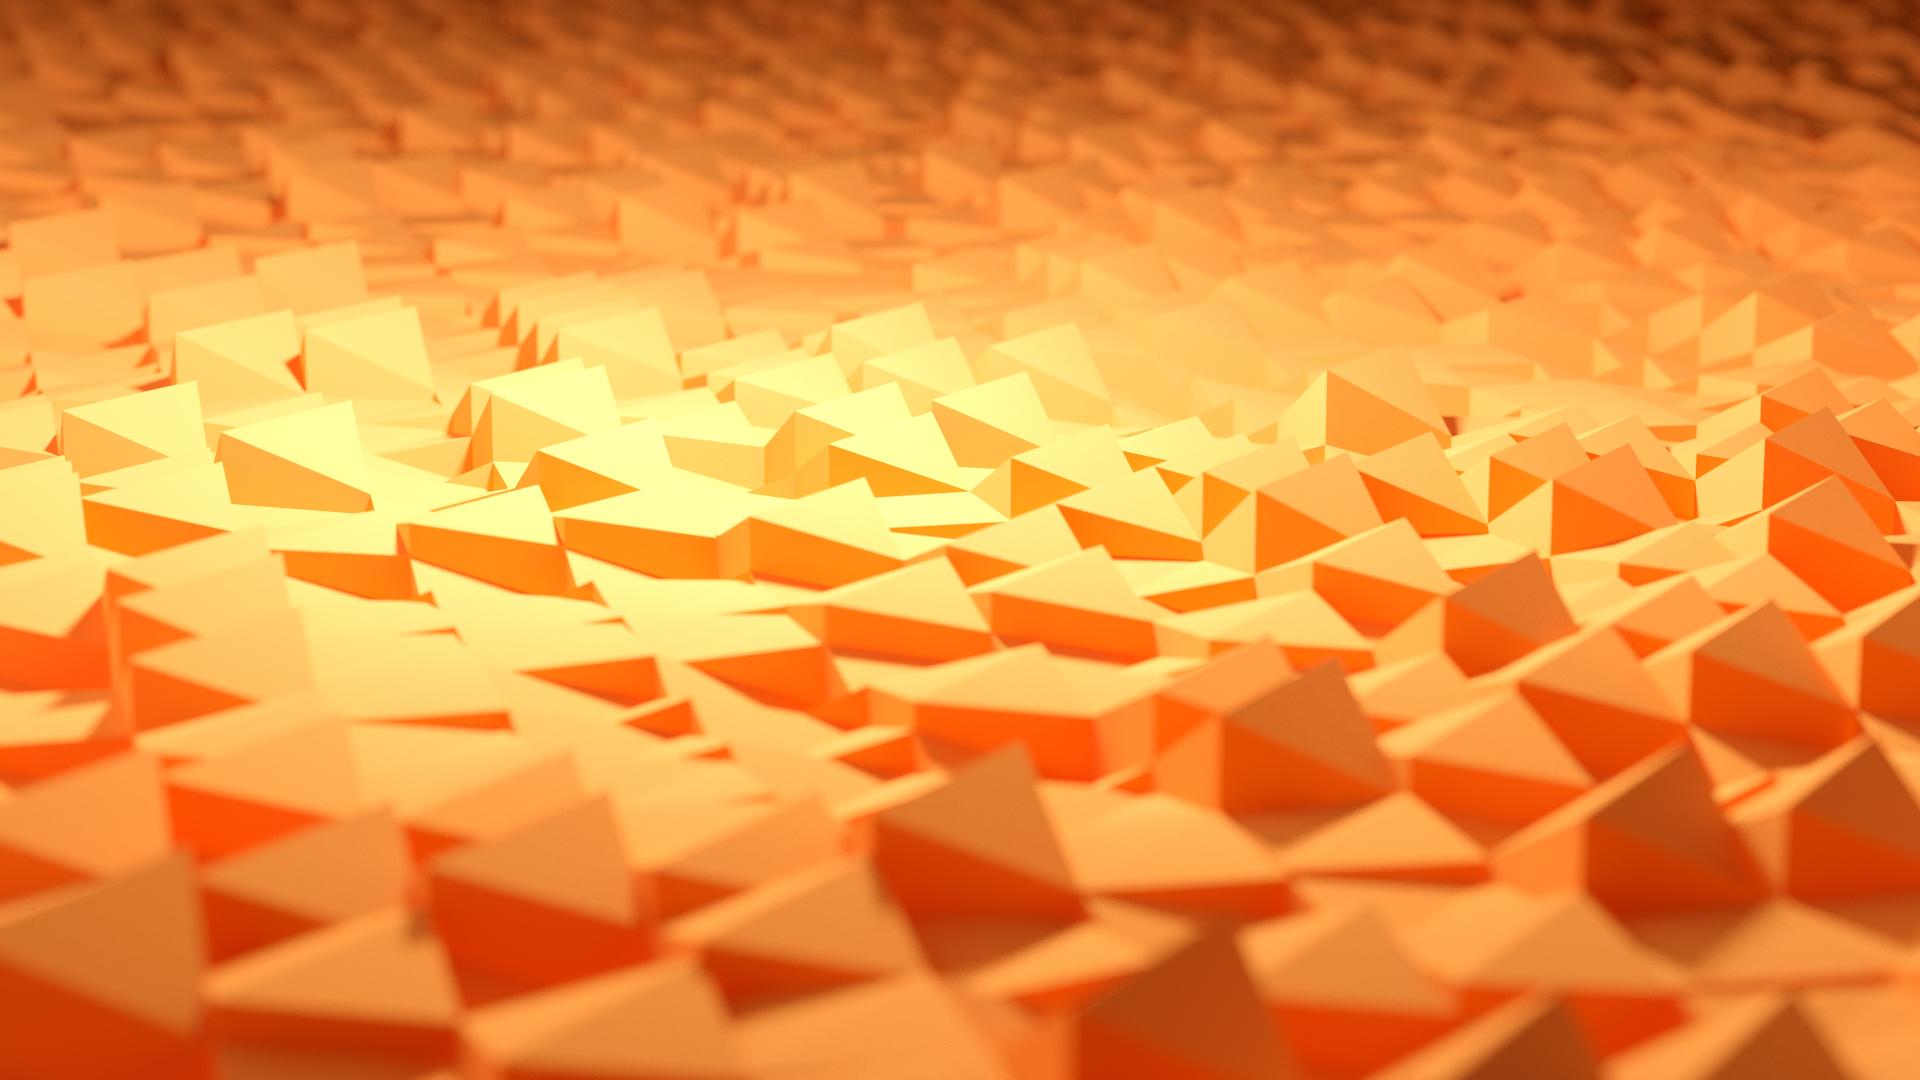 rendering triangle geometry texture desktop wallpaper hd geometric 1920x1080